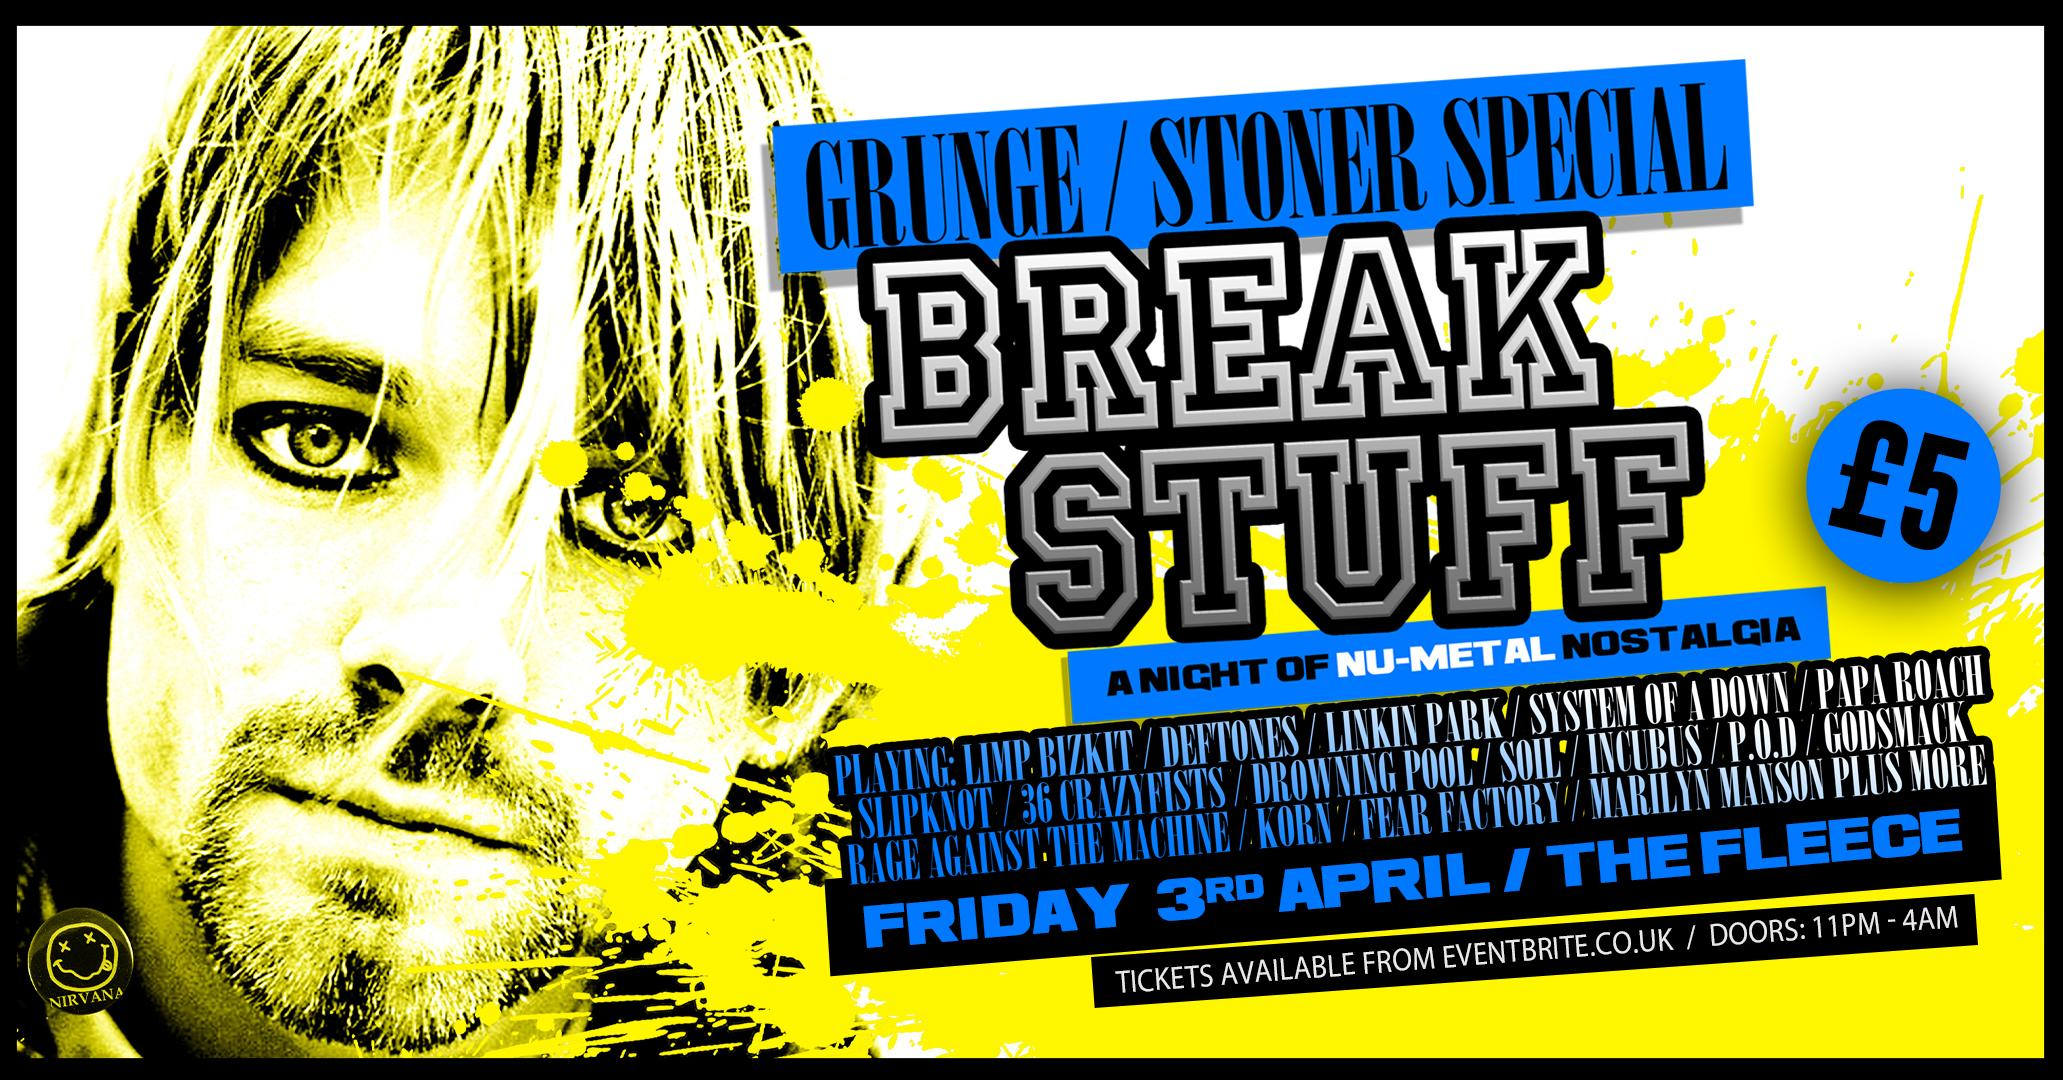 Break Stuff - Grunge / Stoner Special